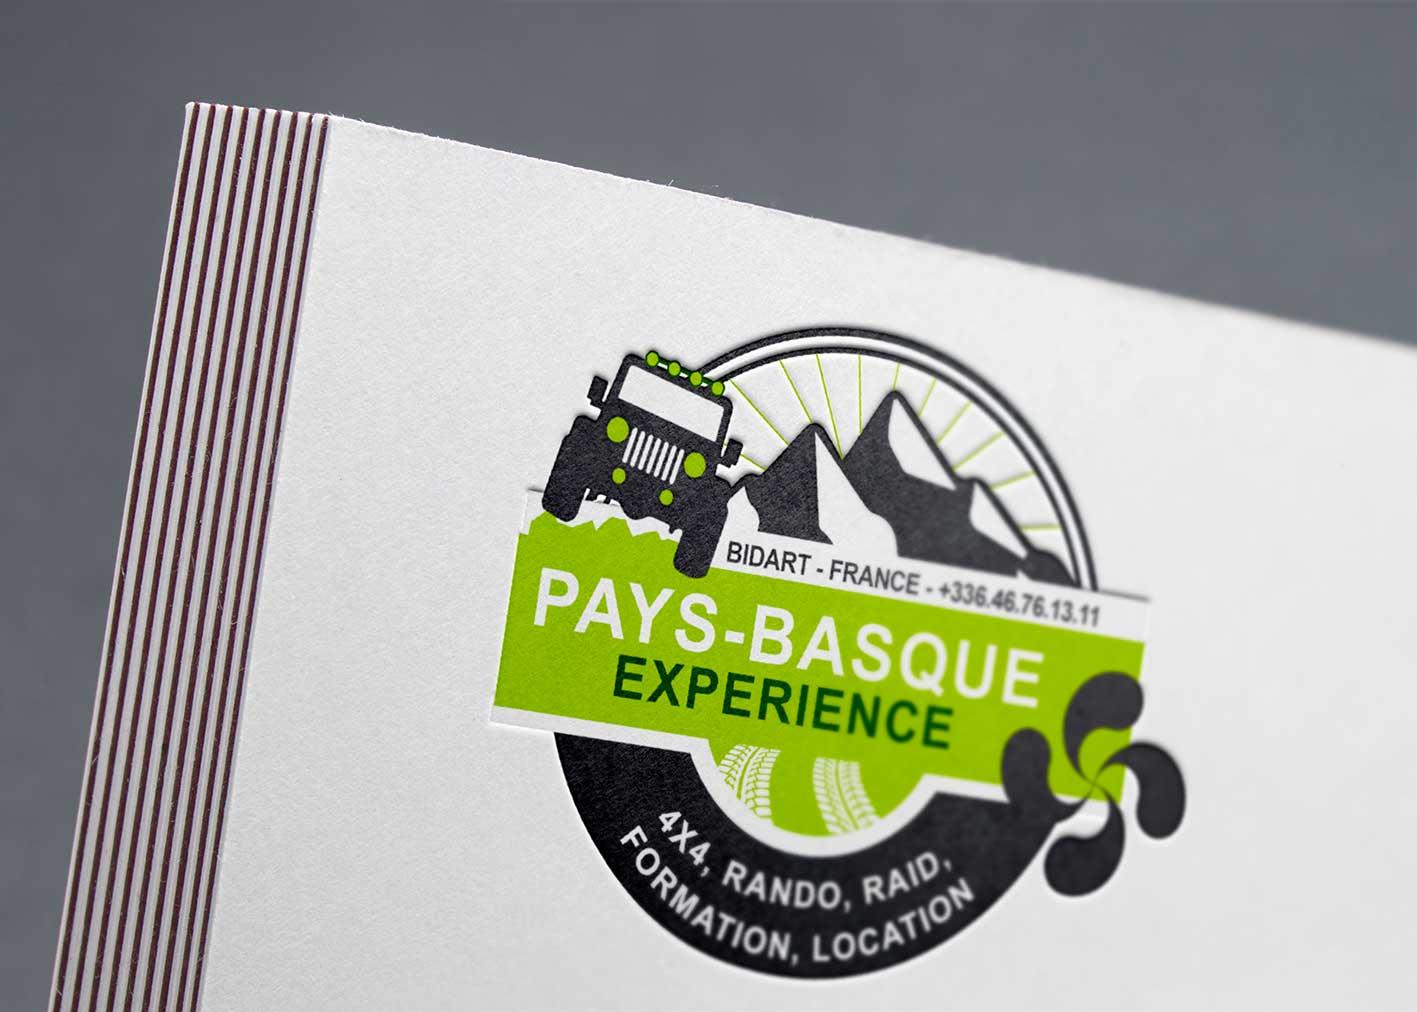 paysbasque-experience-rando-4x4-seminaire